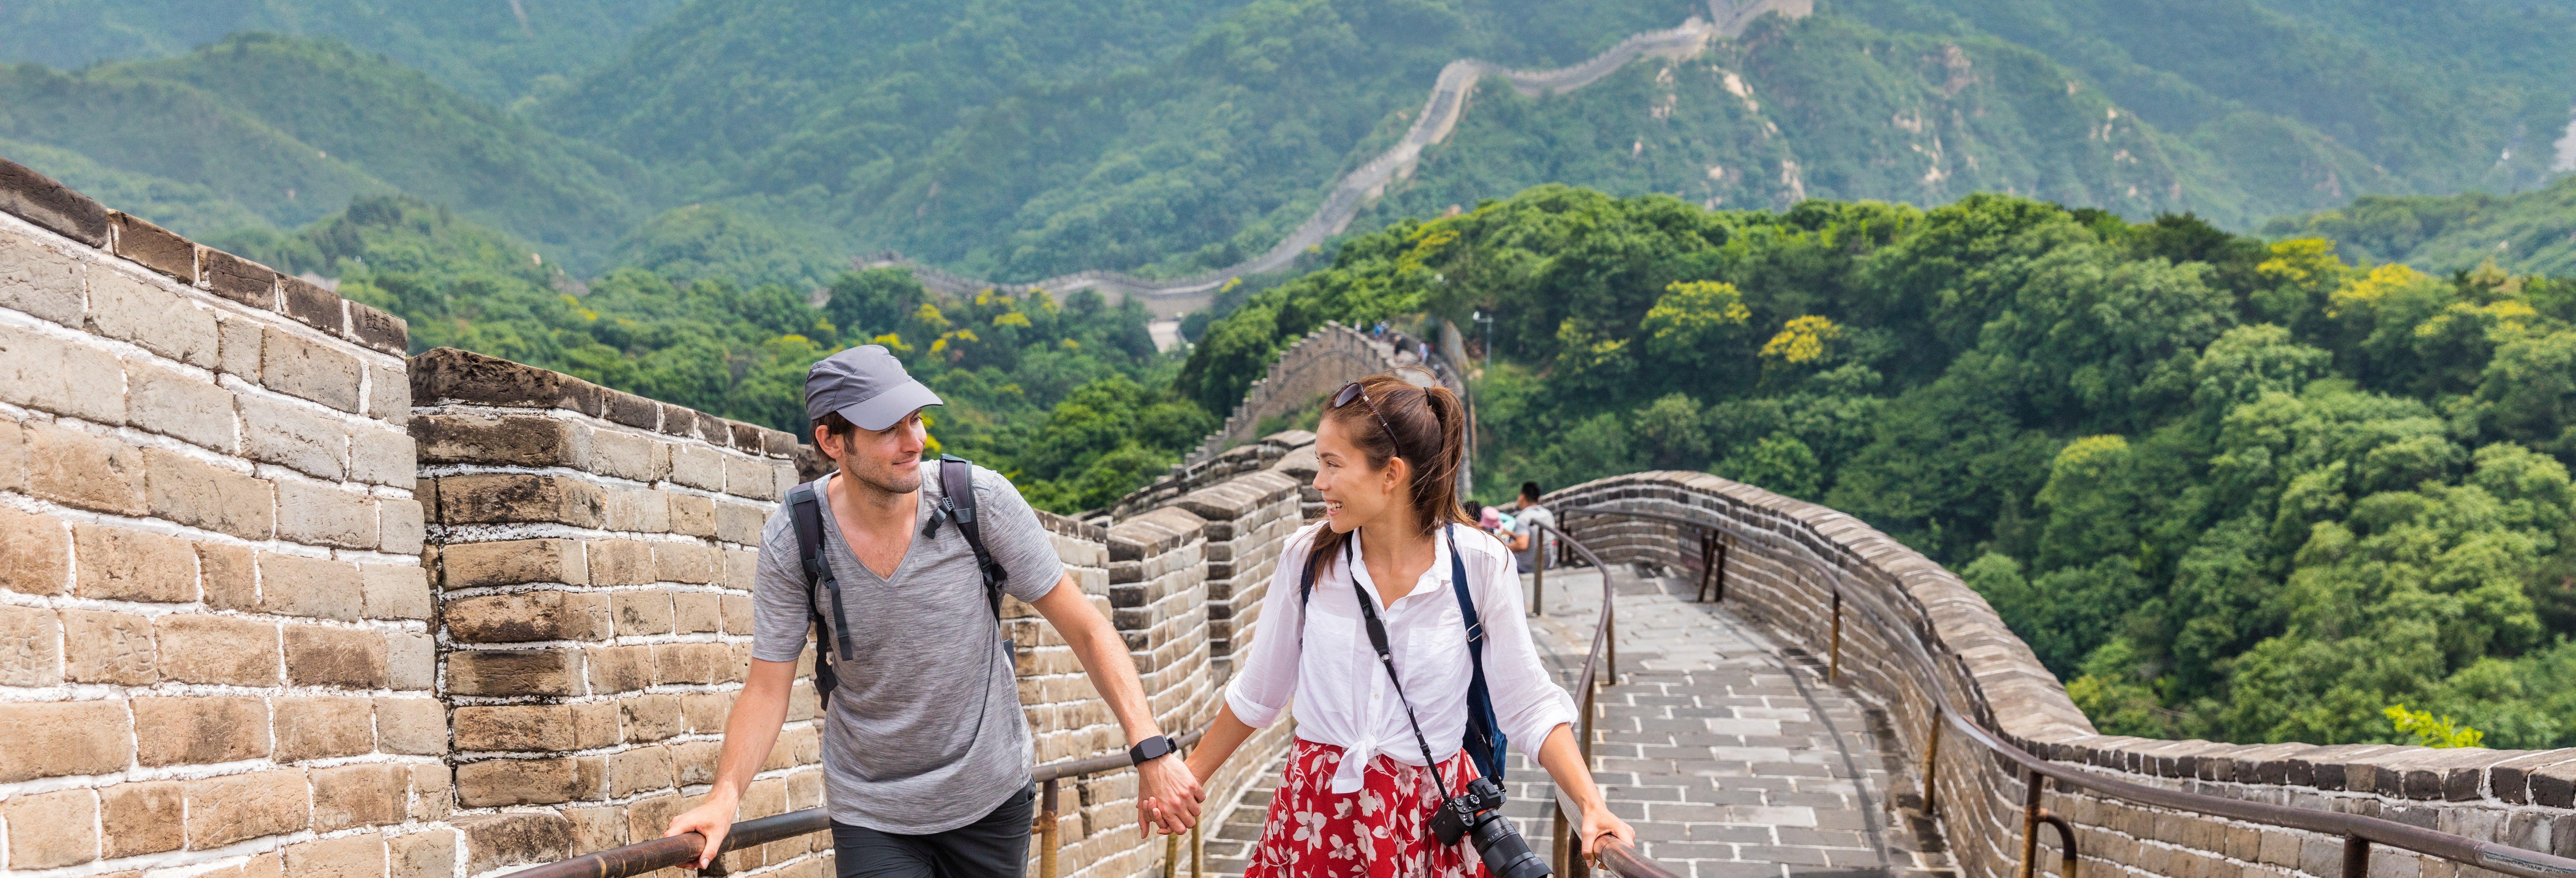 Pechino e Shanghai in 7 giorni